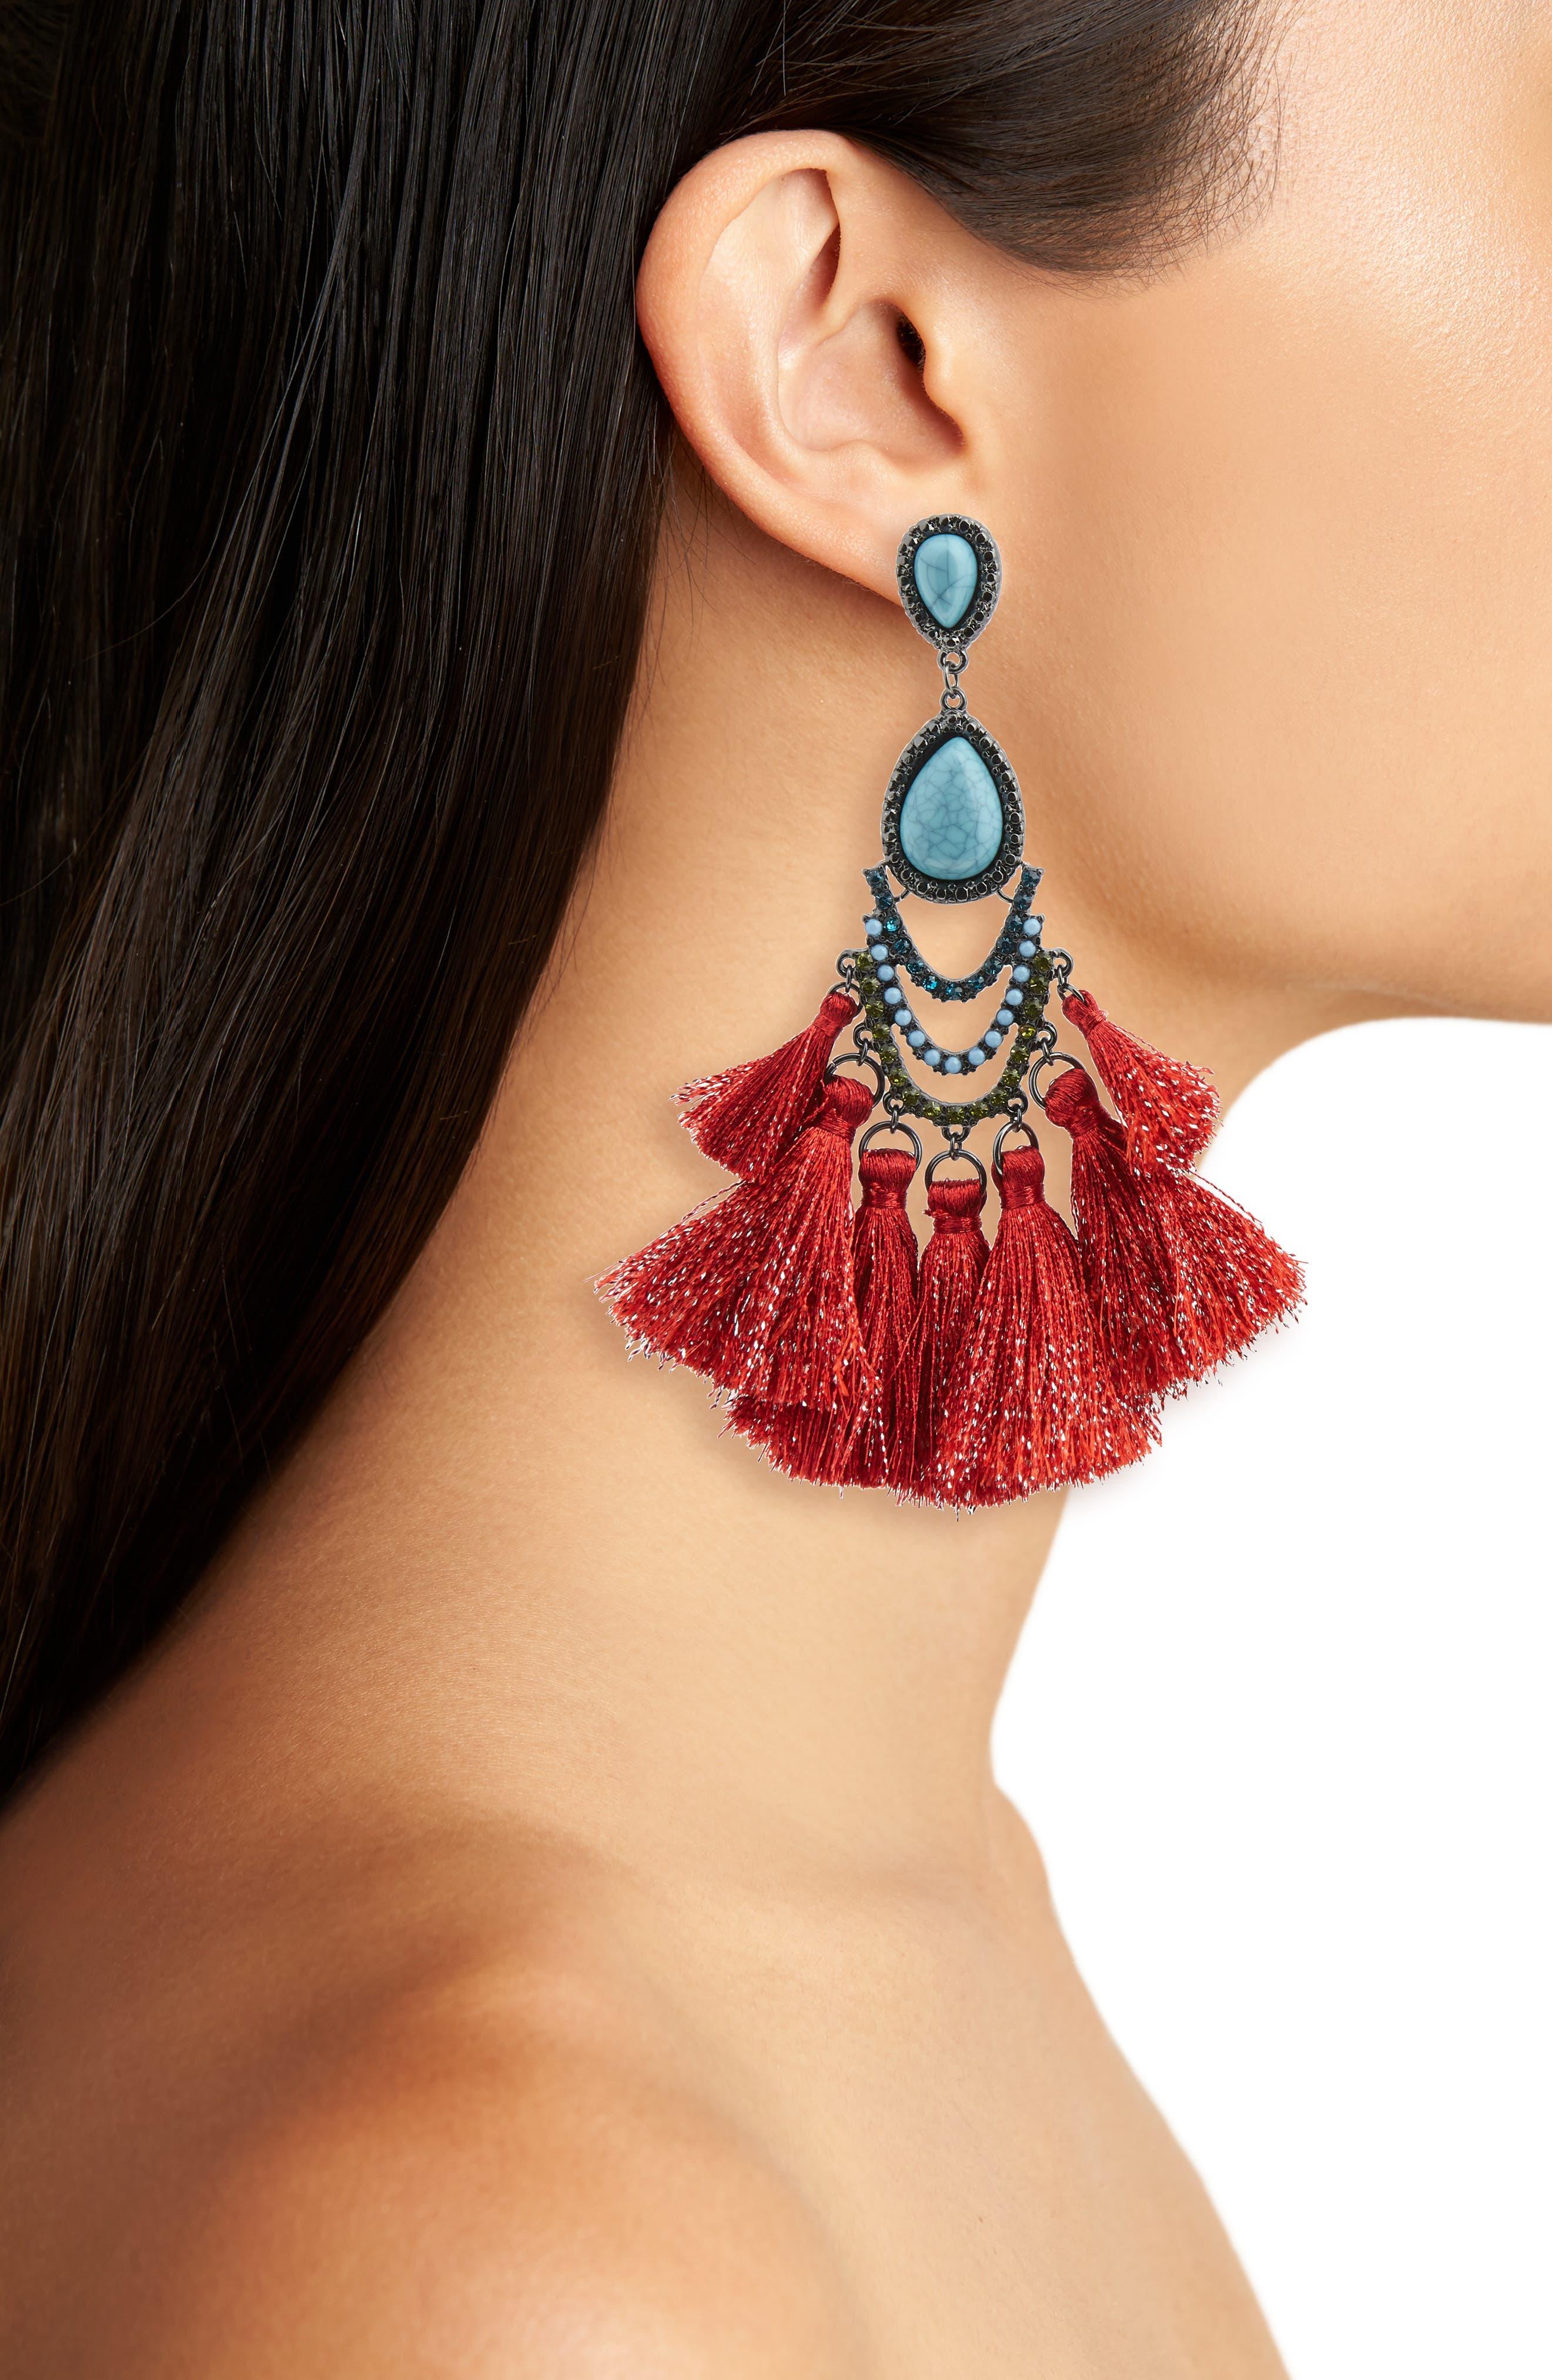 Tassel Drop Earrings,                             Alternate thumbnail 2, color,                             TEAL/ RED/ MULTI